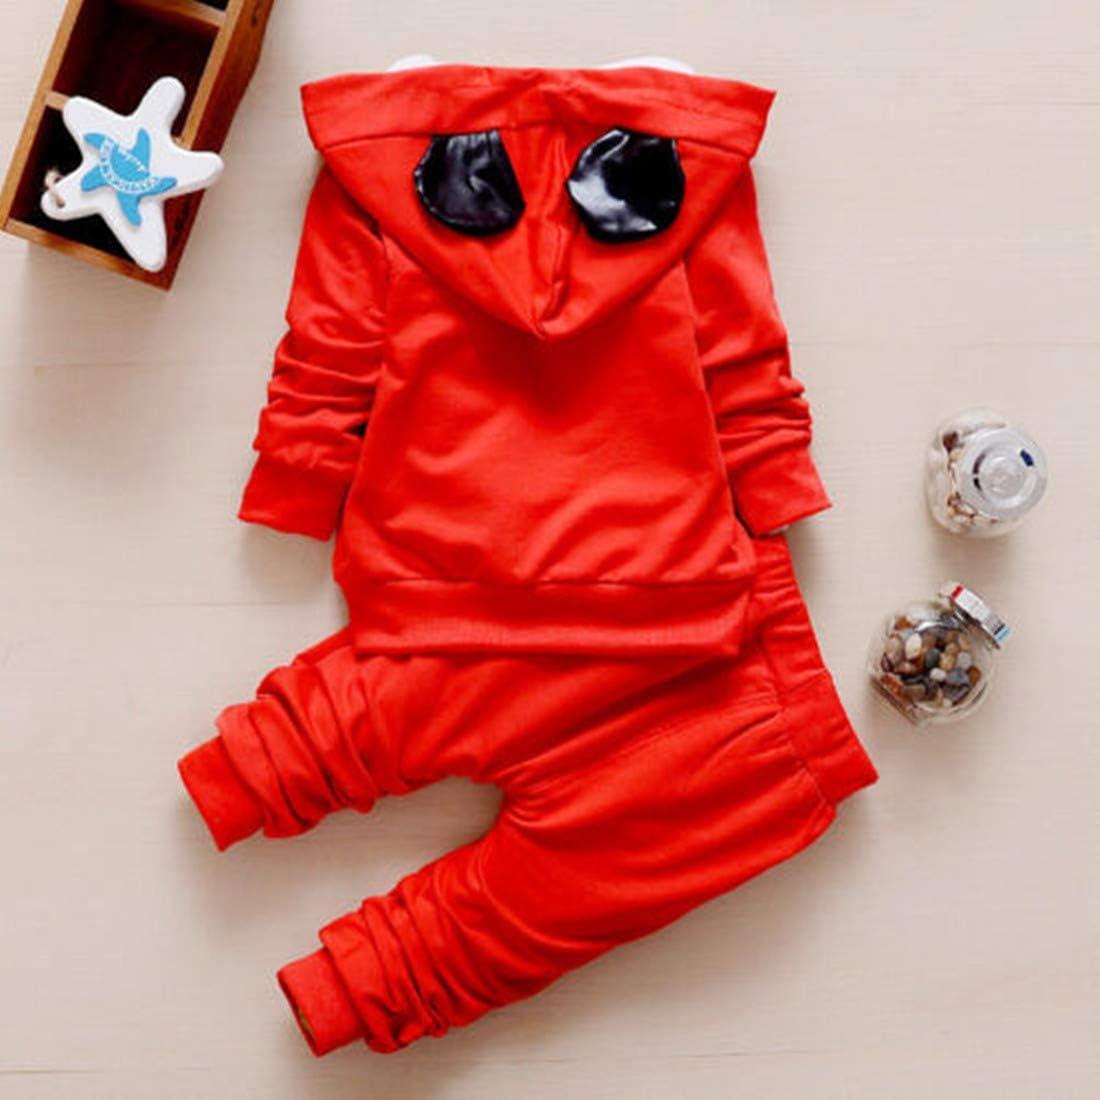 TOHD 3pcs Baby Toddler Clothes Boys Coat+T Shirt Pants Tracksuit Outfits Set Cartoon